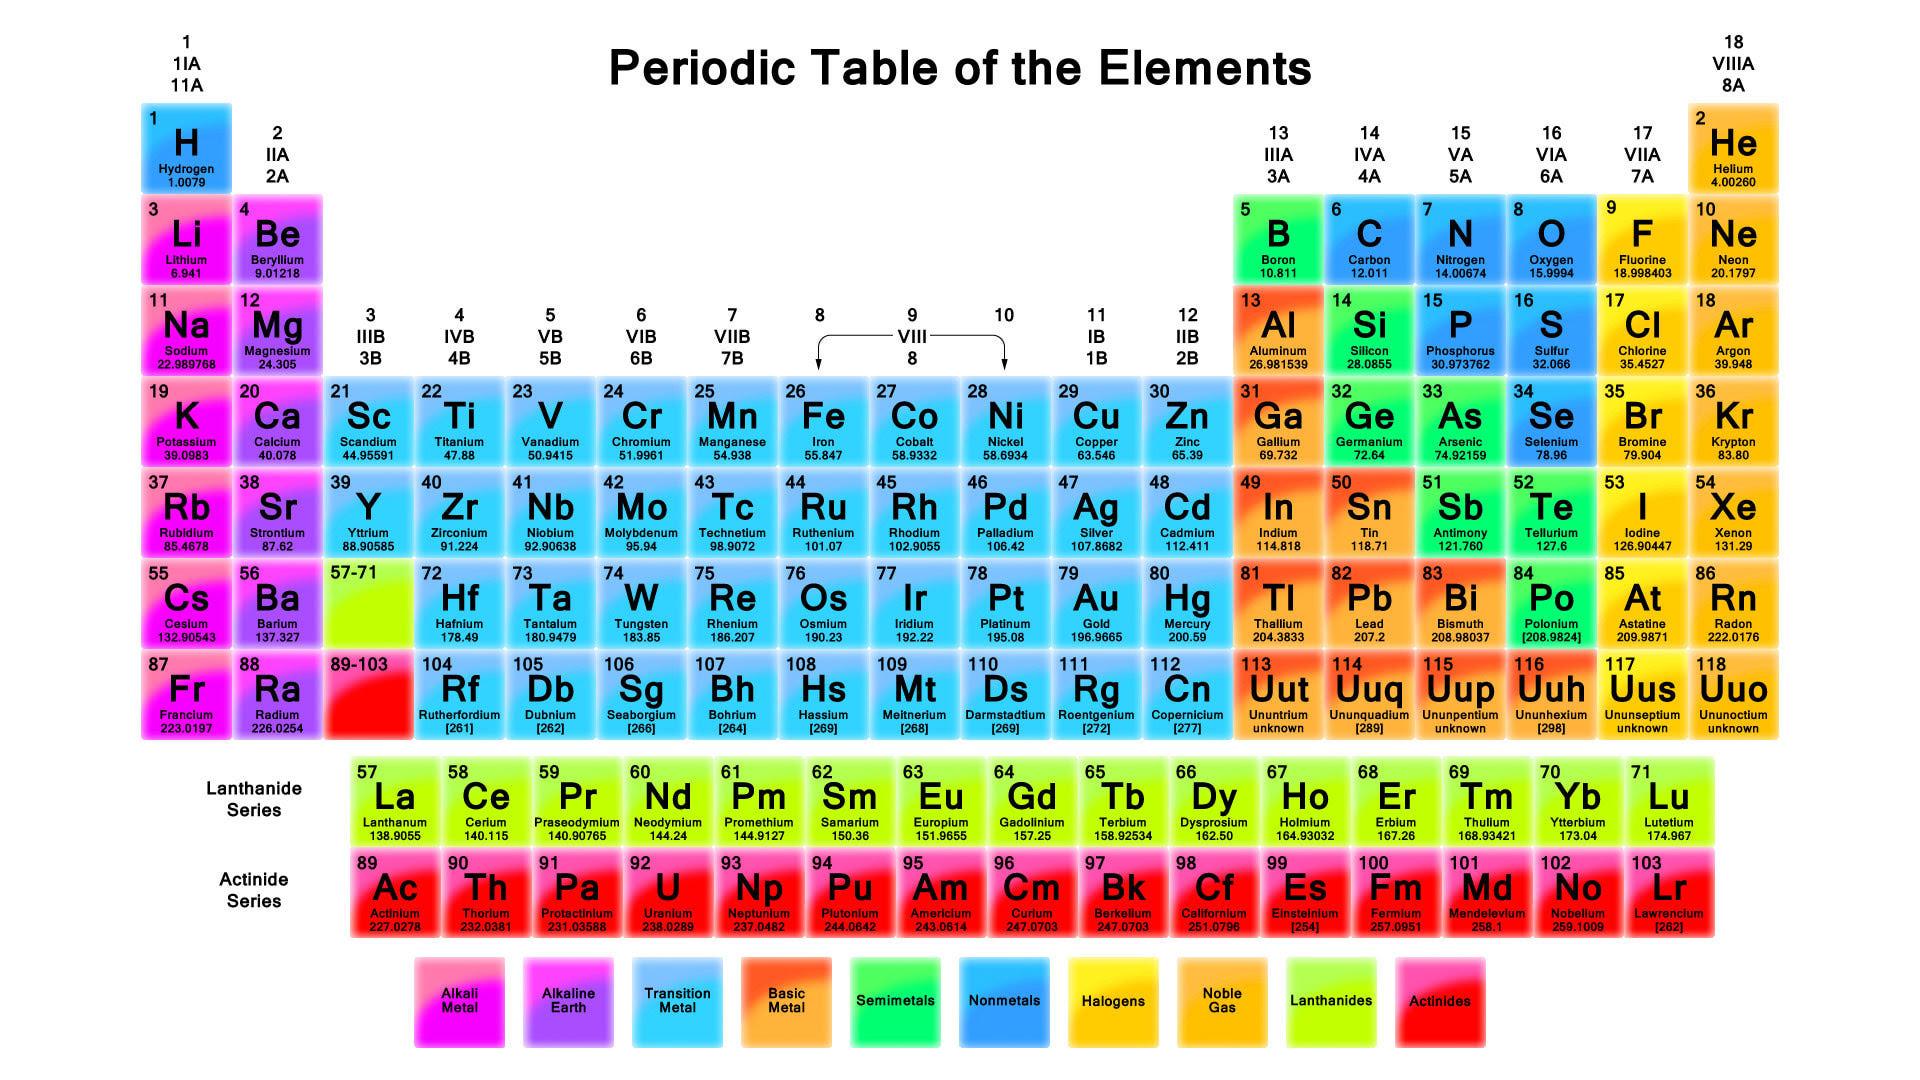 83 Periodic Table Iodine Atomic Number Number Periodic Iodine Table